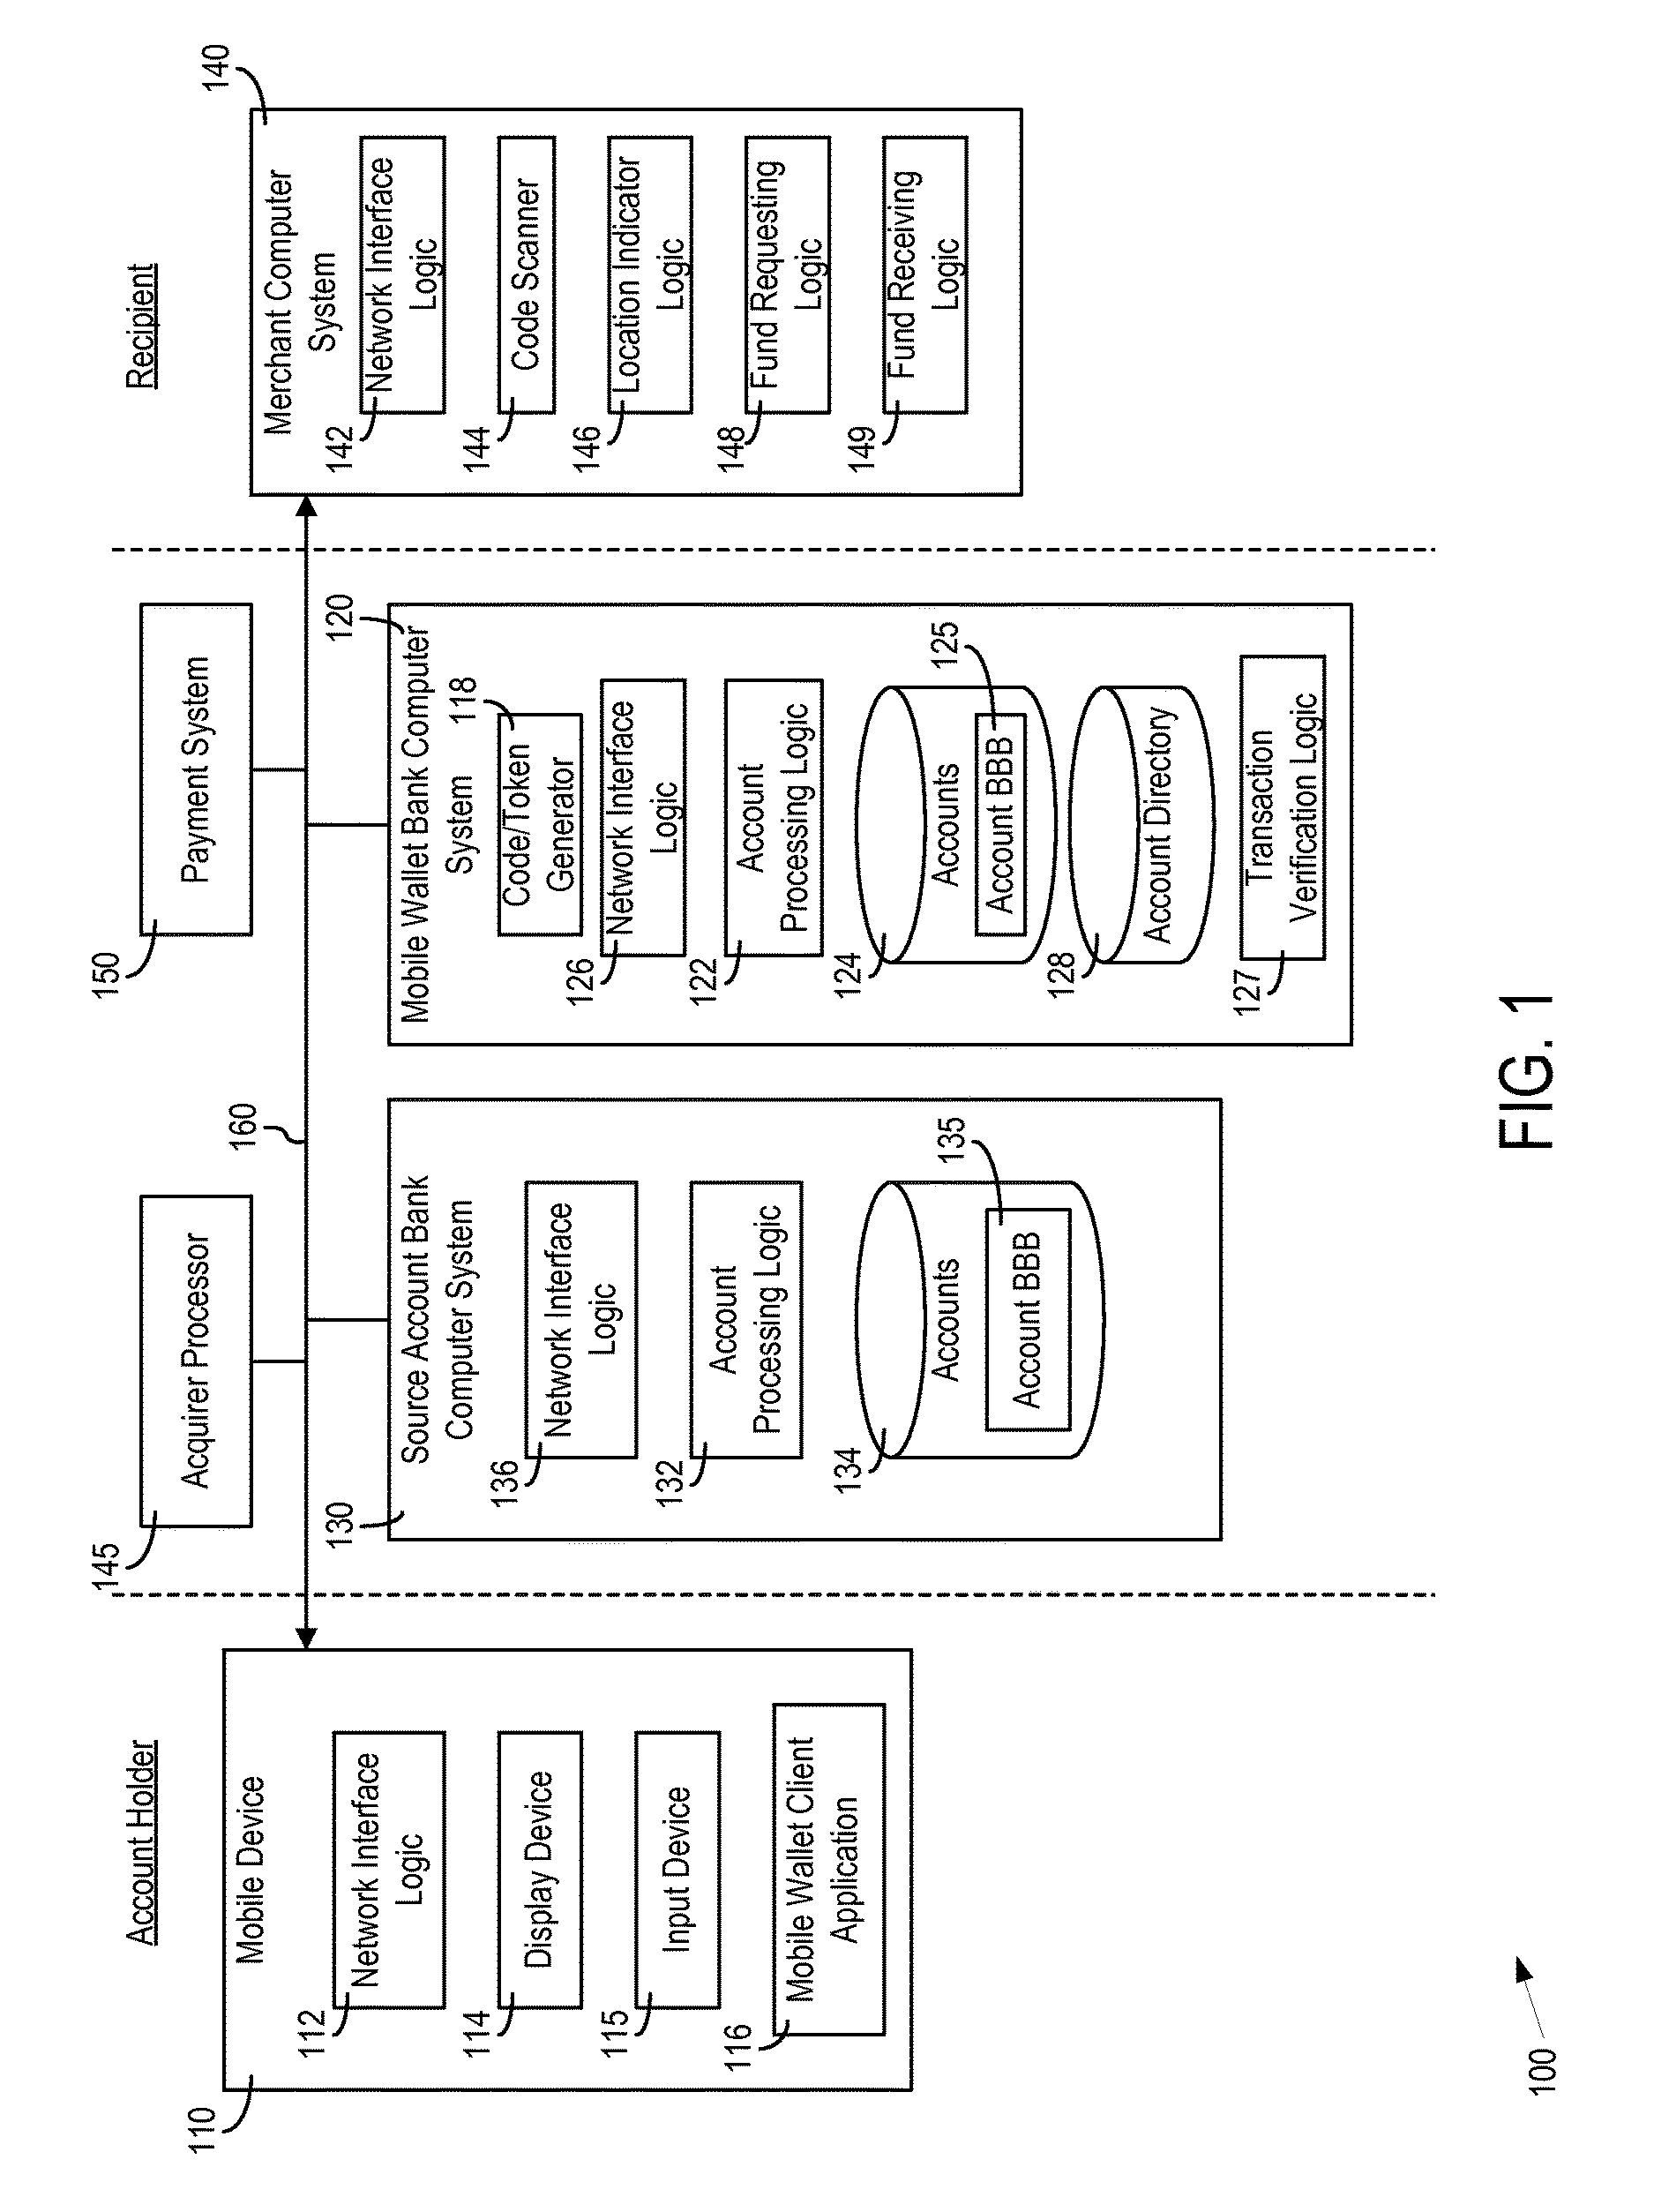 Patent US 9,652,770 B1